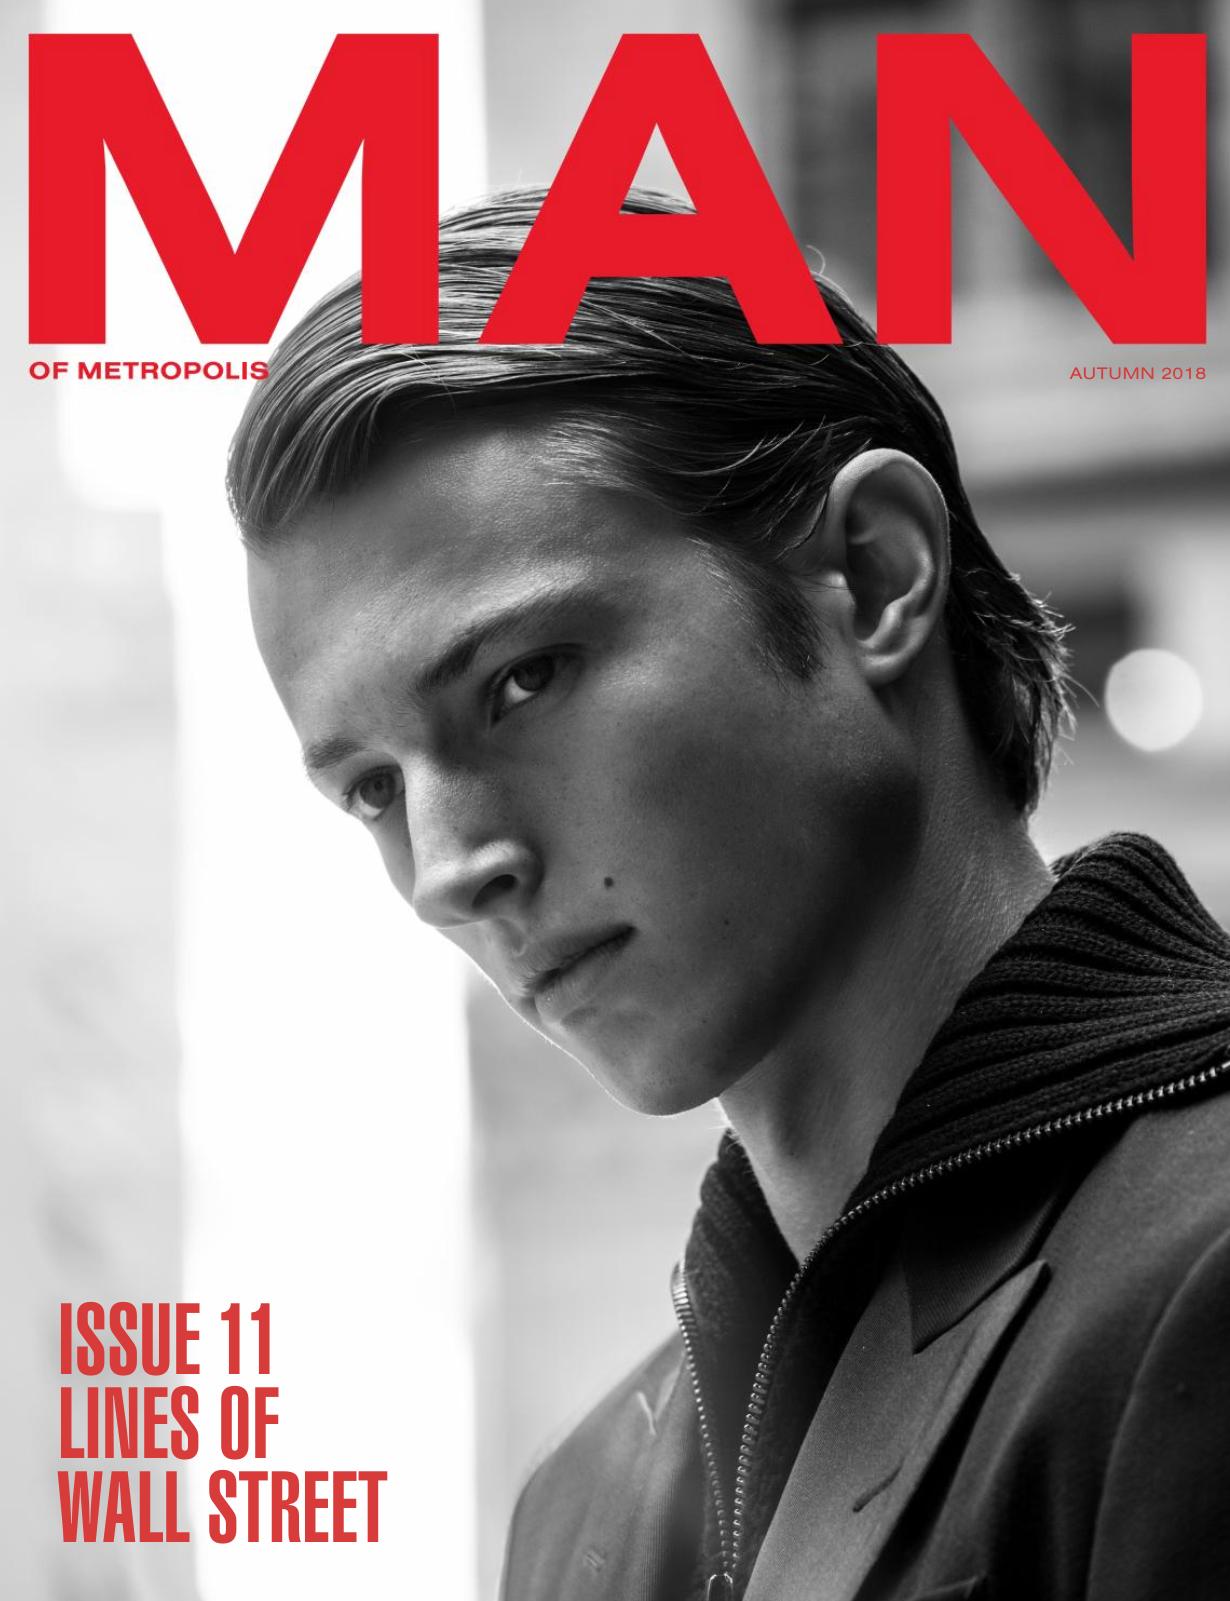 Man of Metropolis Magazine issue 11.png